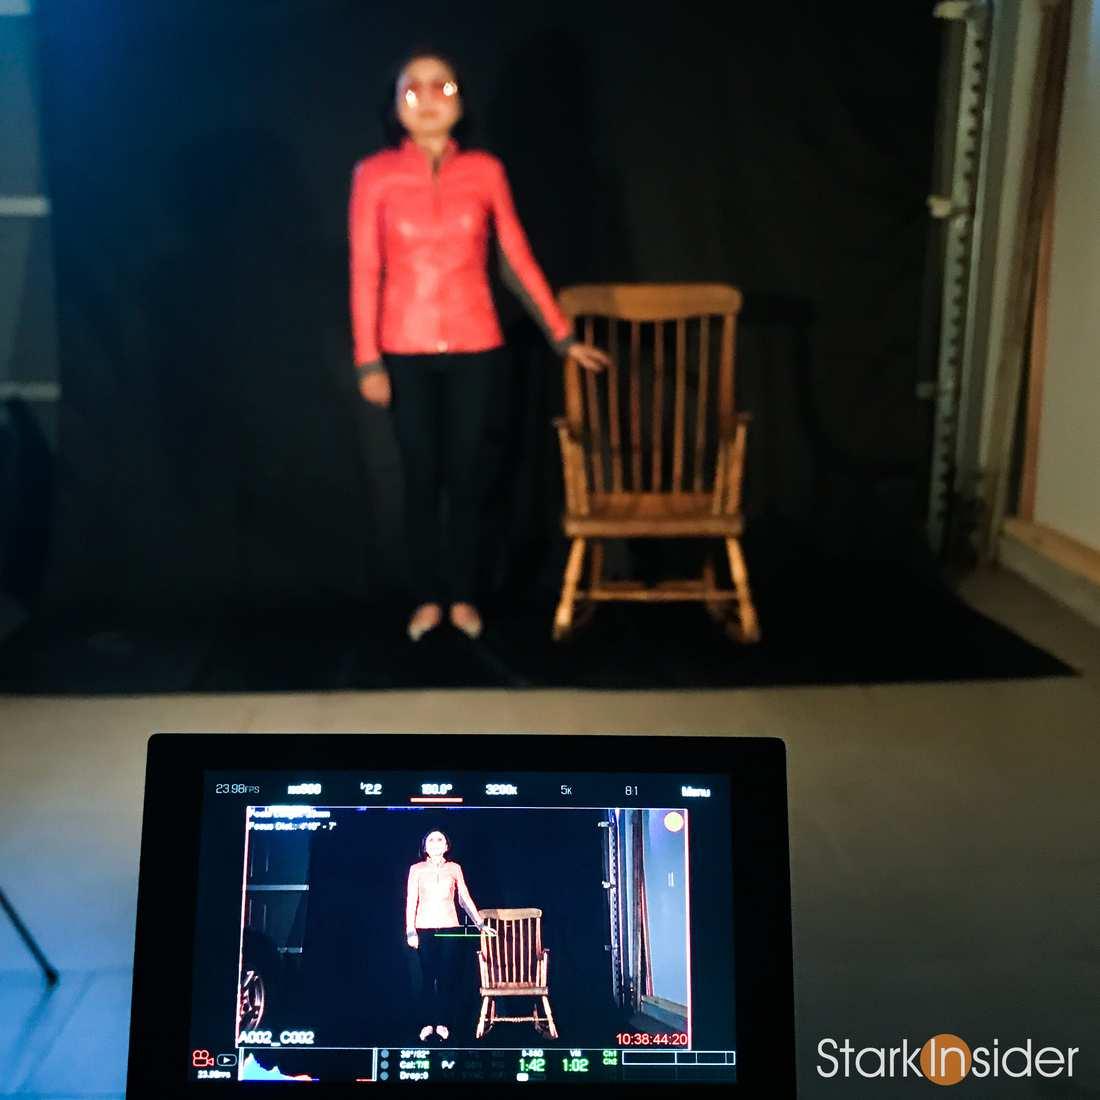 3 DAYS IN PARIS - Loni Stark - Rocking Chair Scene